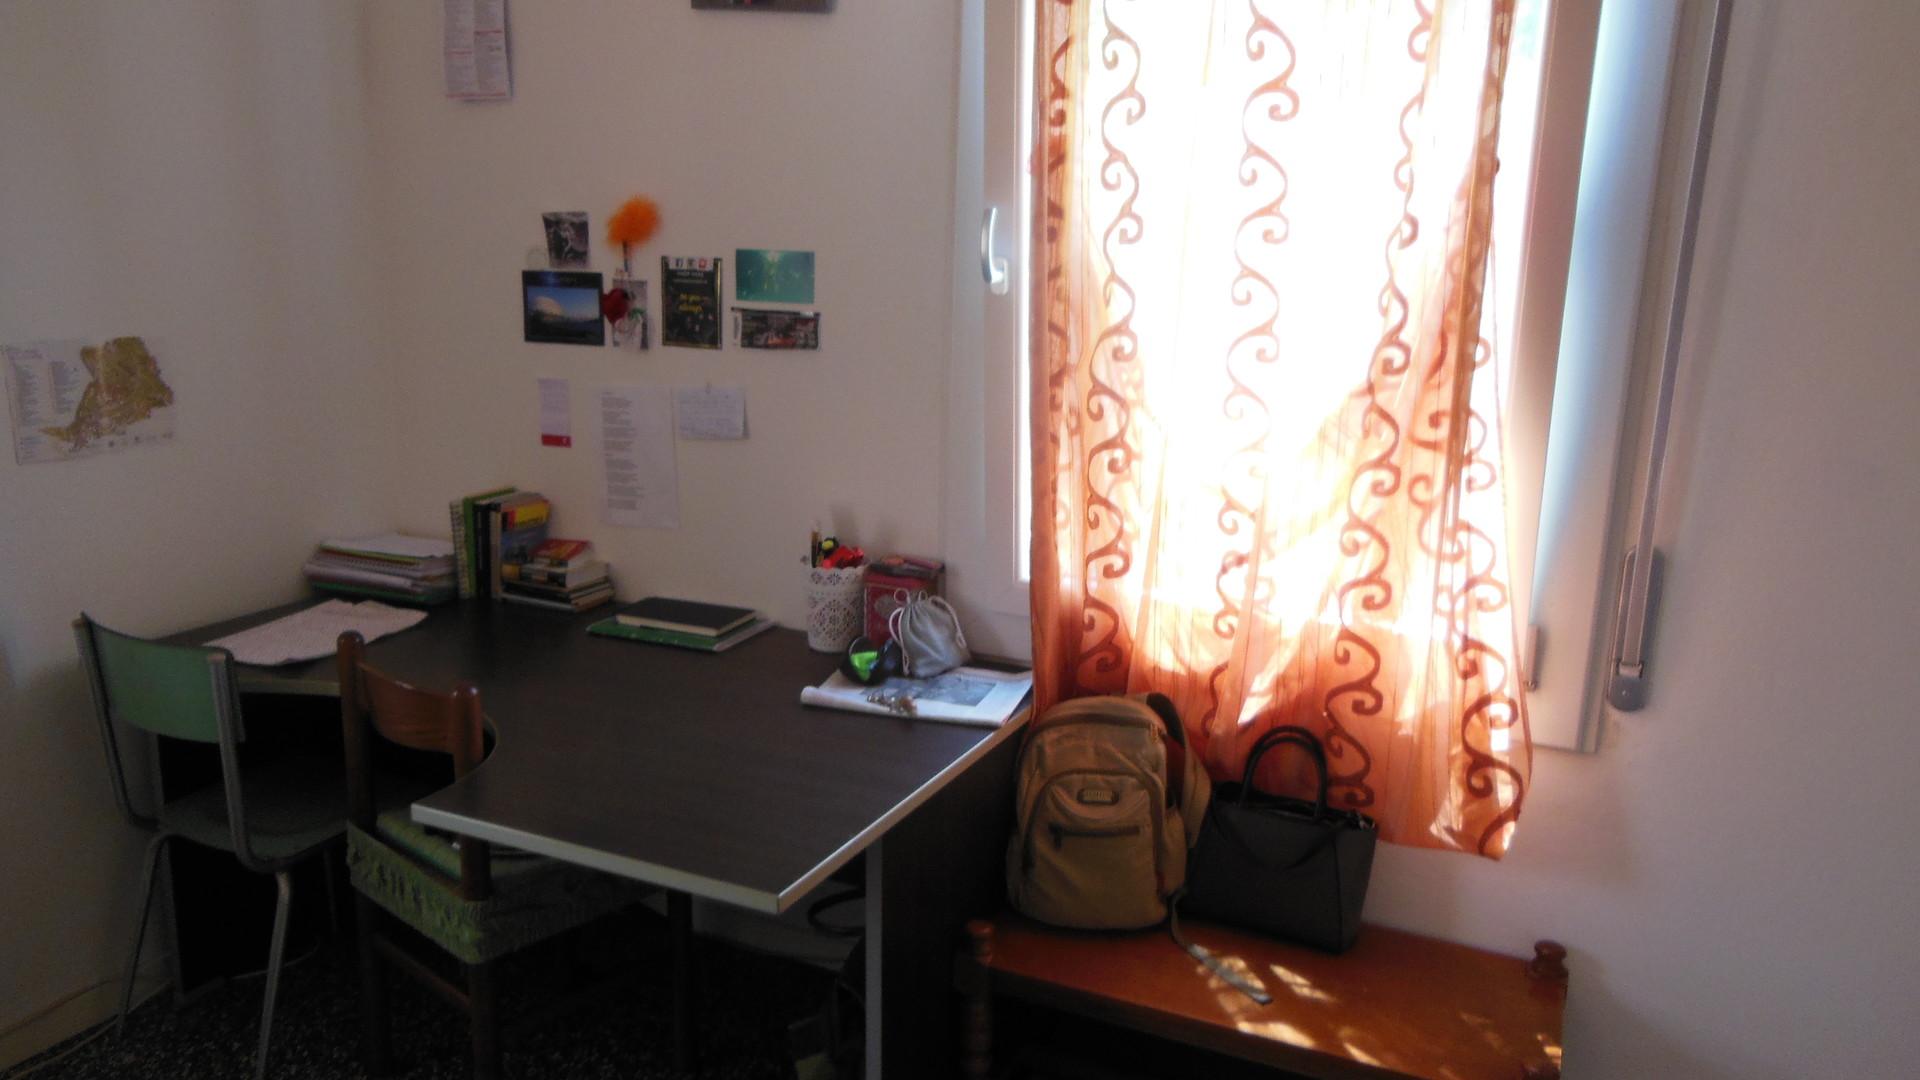 single-double-room-near-centre-modena-9be28bdb10381fc791fccd5d9b5005c9